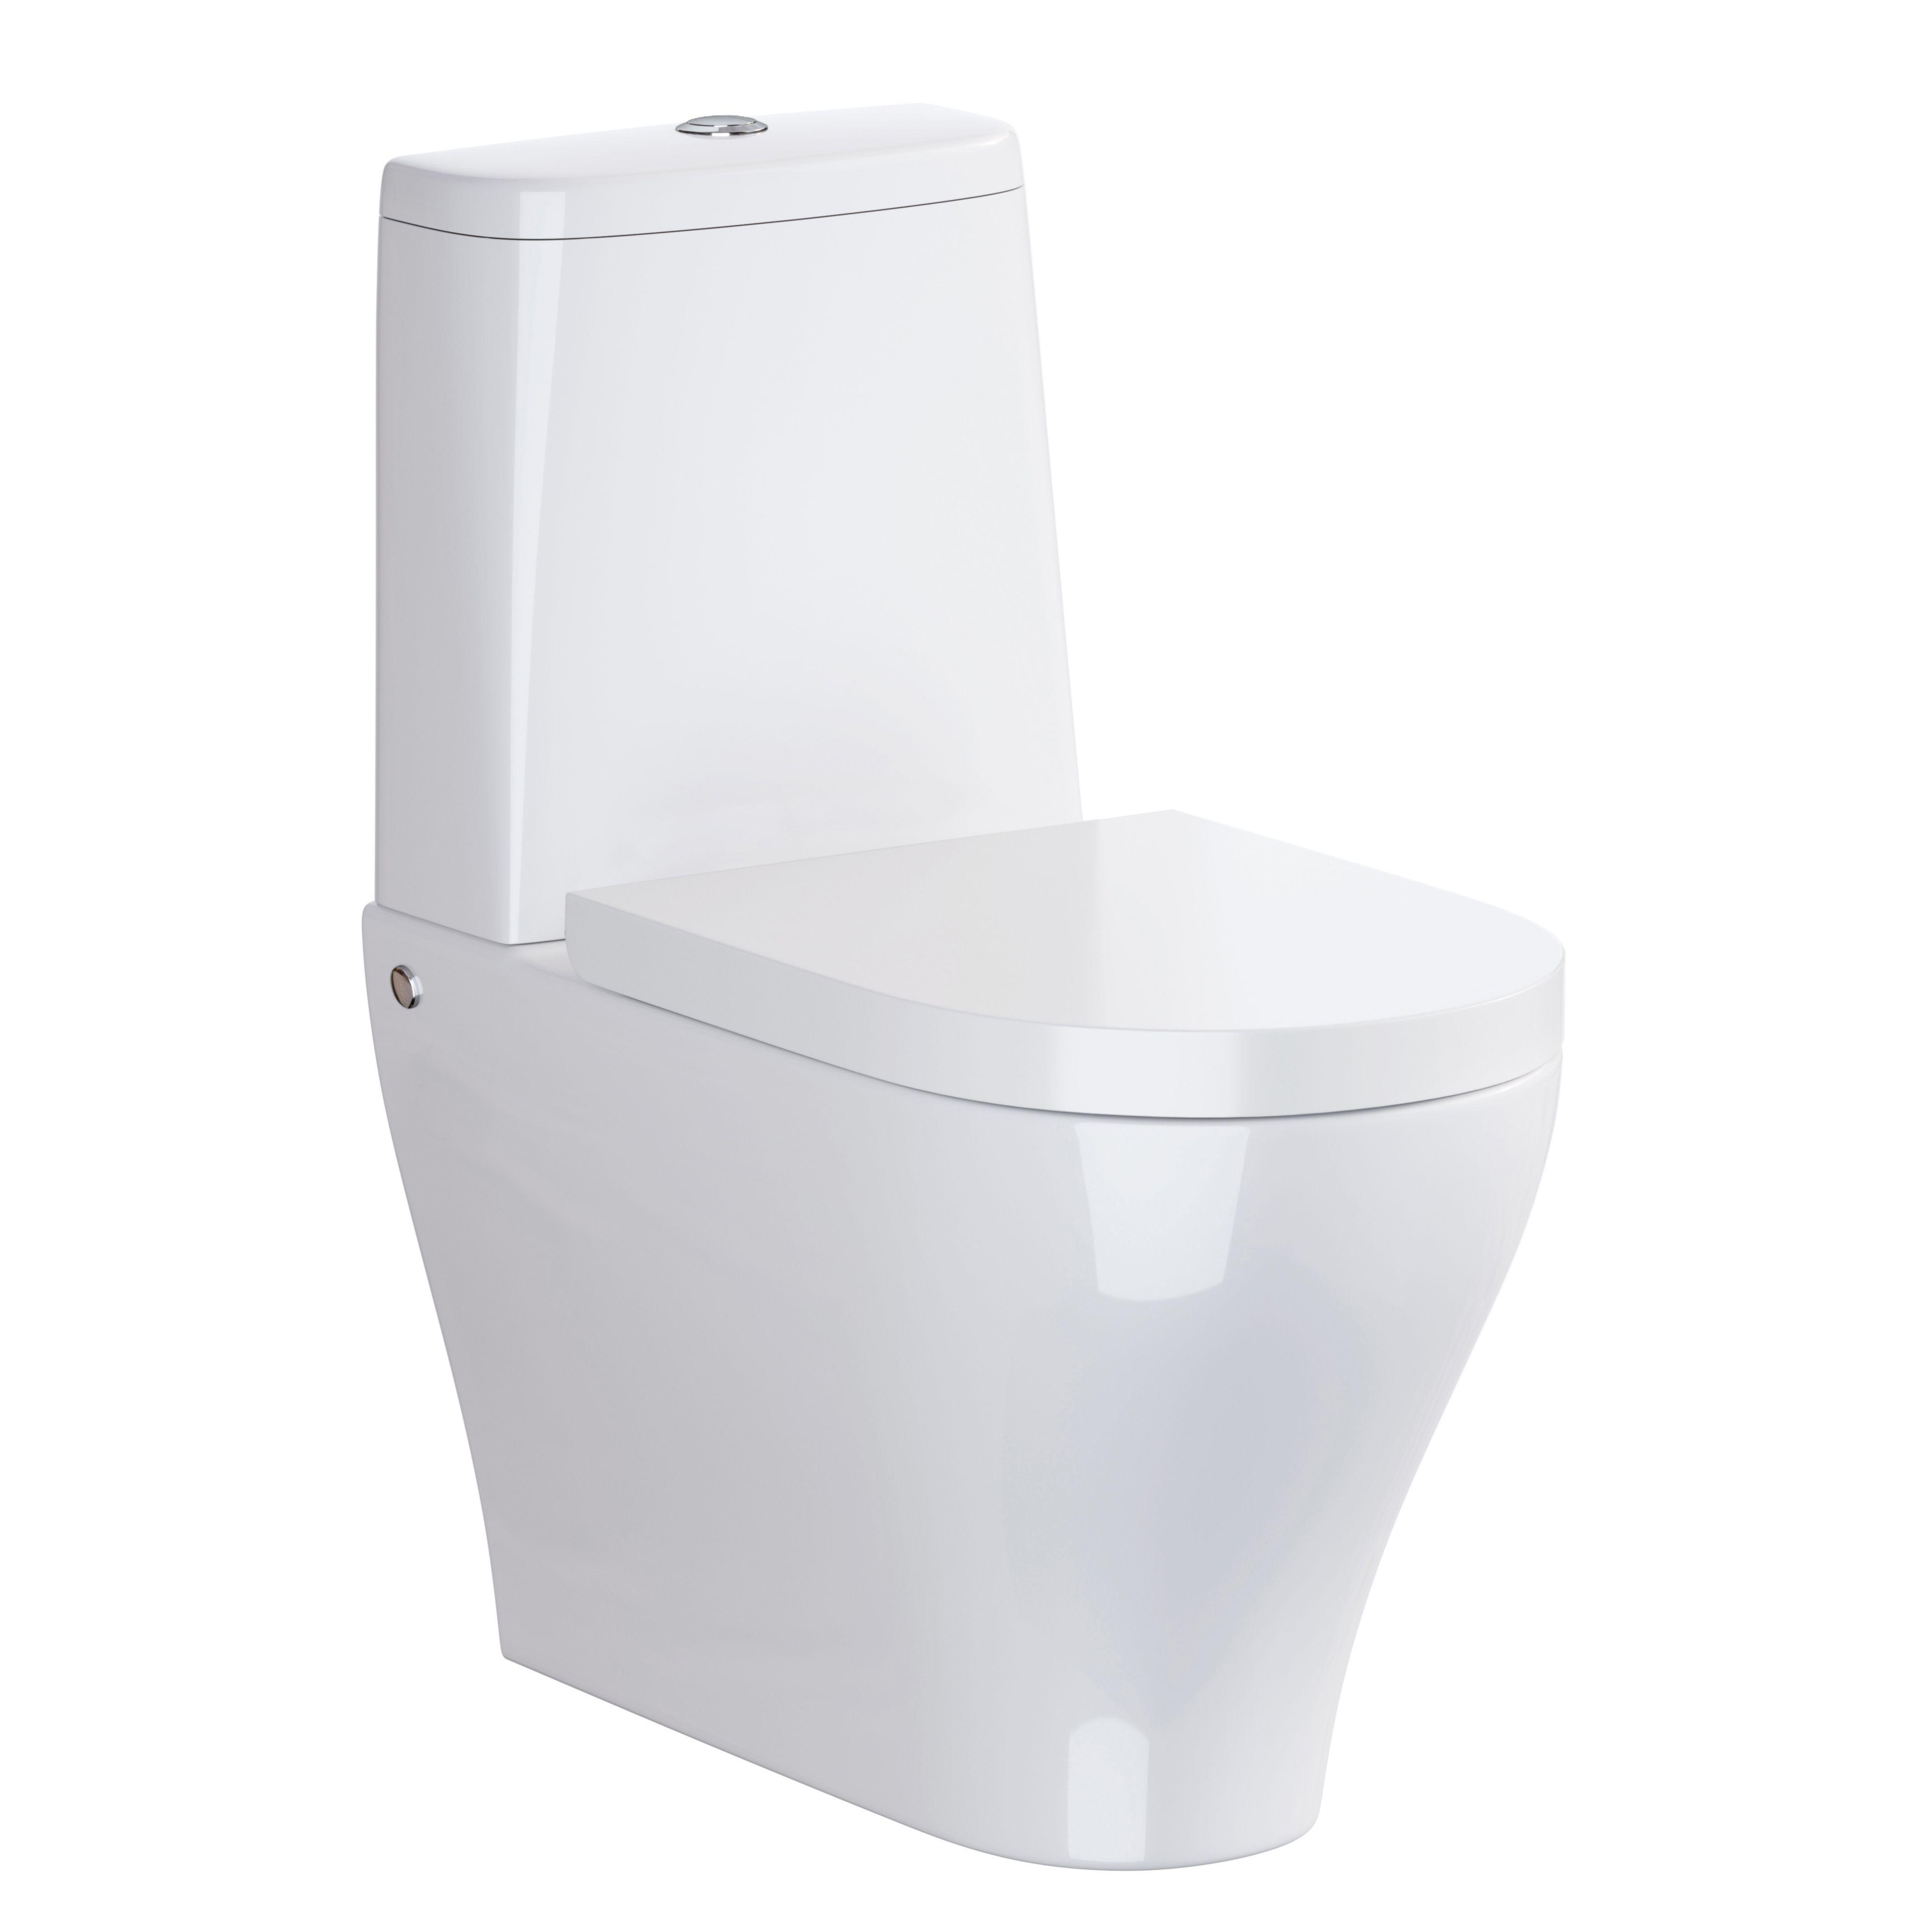 Magnificent Cooke Lewis Alassio Close Coupled Toilet With Soft Close Machost Co Dining Chair Design Ideas Machostcouk